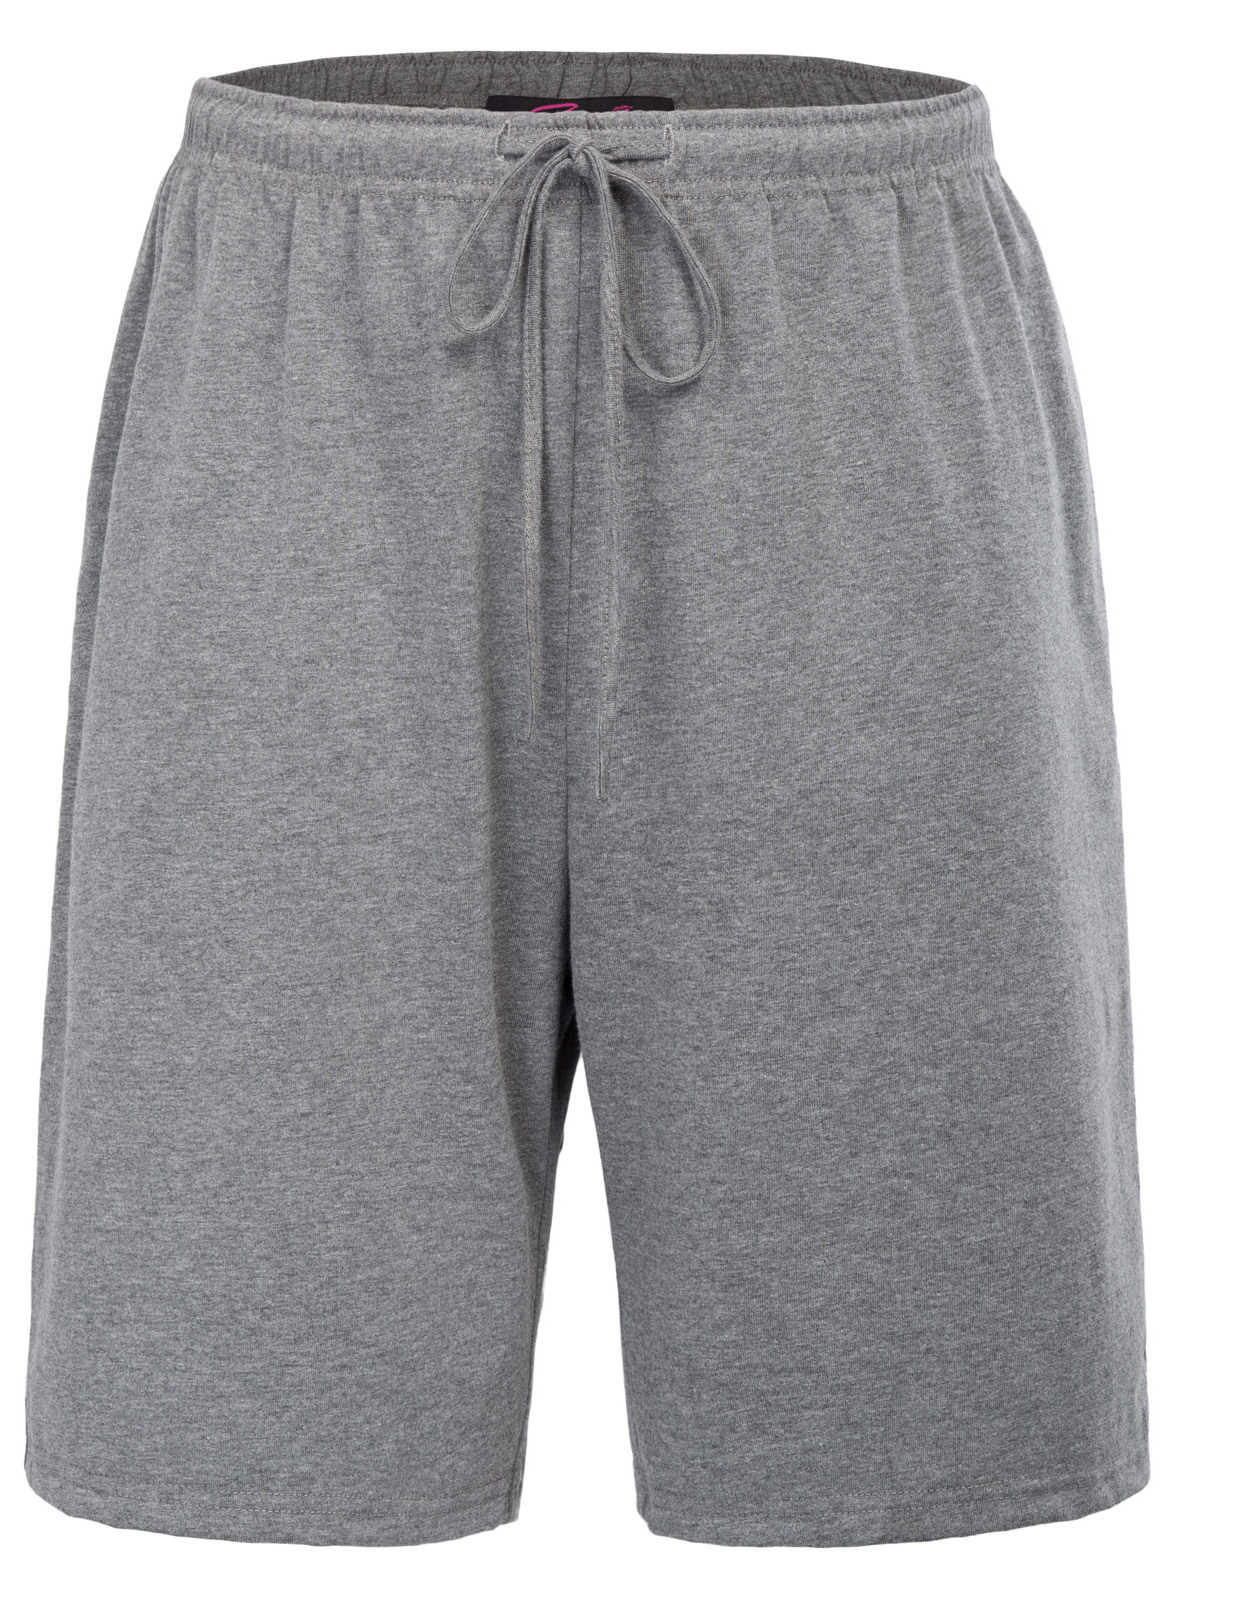 Men's Sleep Bottoms Loose Elastic Waist Lounge Sleep Shorts Summer Solid Color Cotton Comfortable Home Night Short Pants